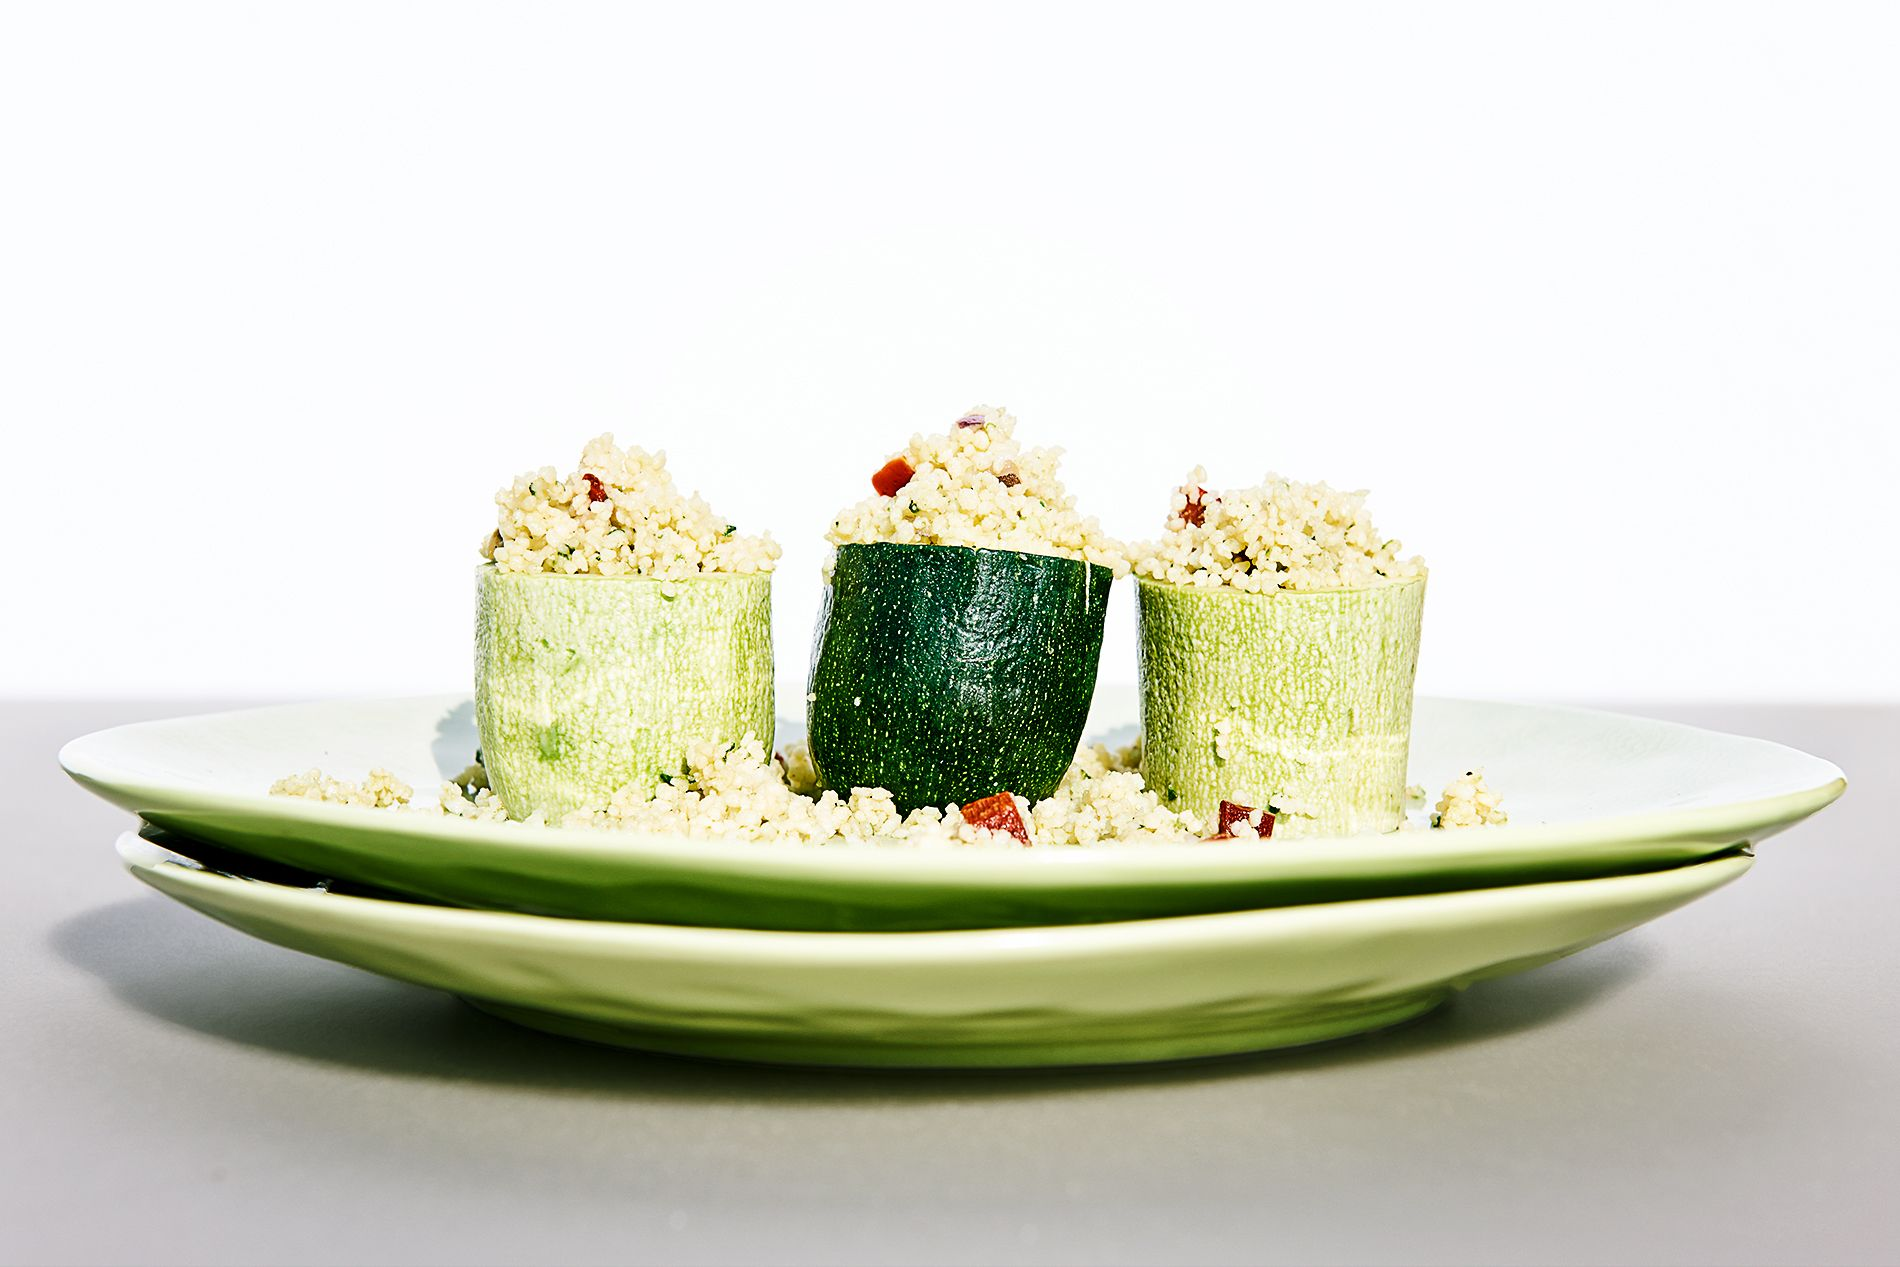 Zweierlei Zucchini gefüllt mit Gemüse-Couscous